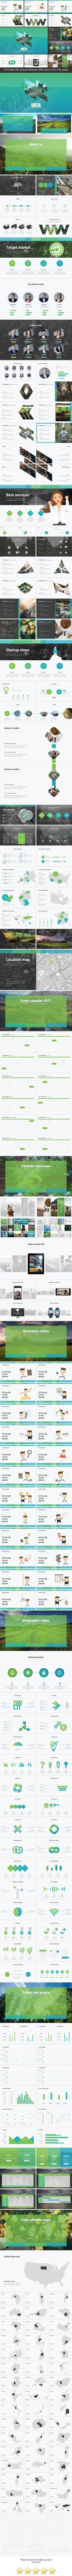 Vista Creative -  Keynote Template for Business